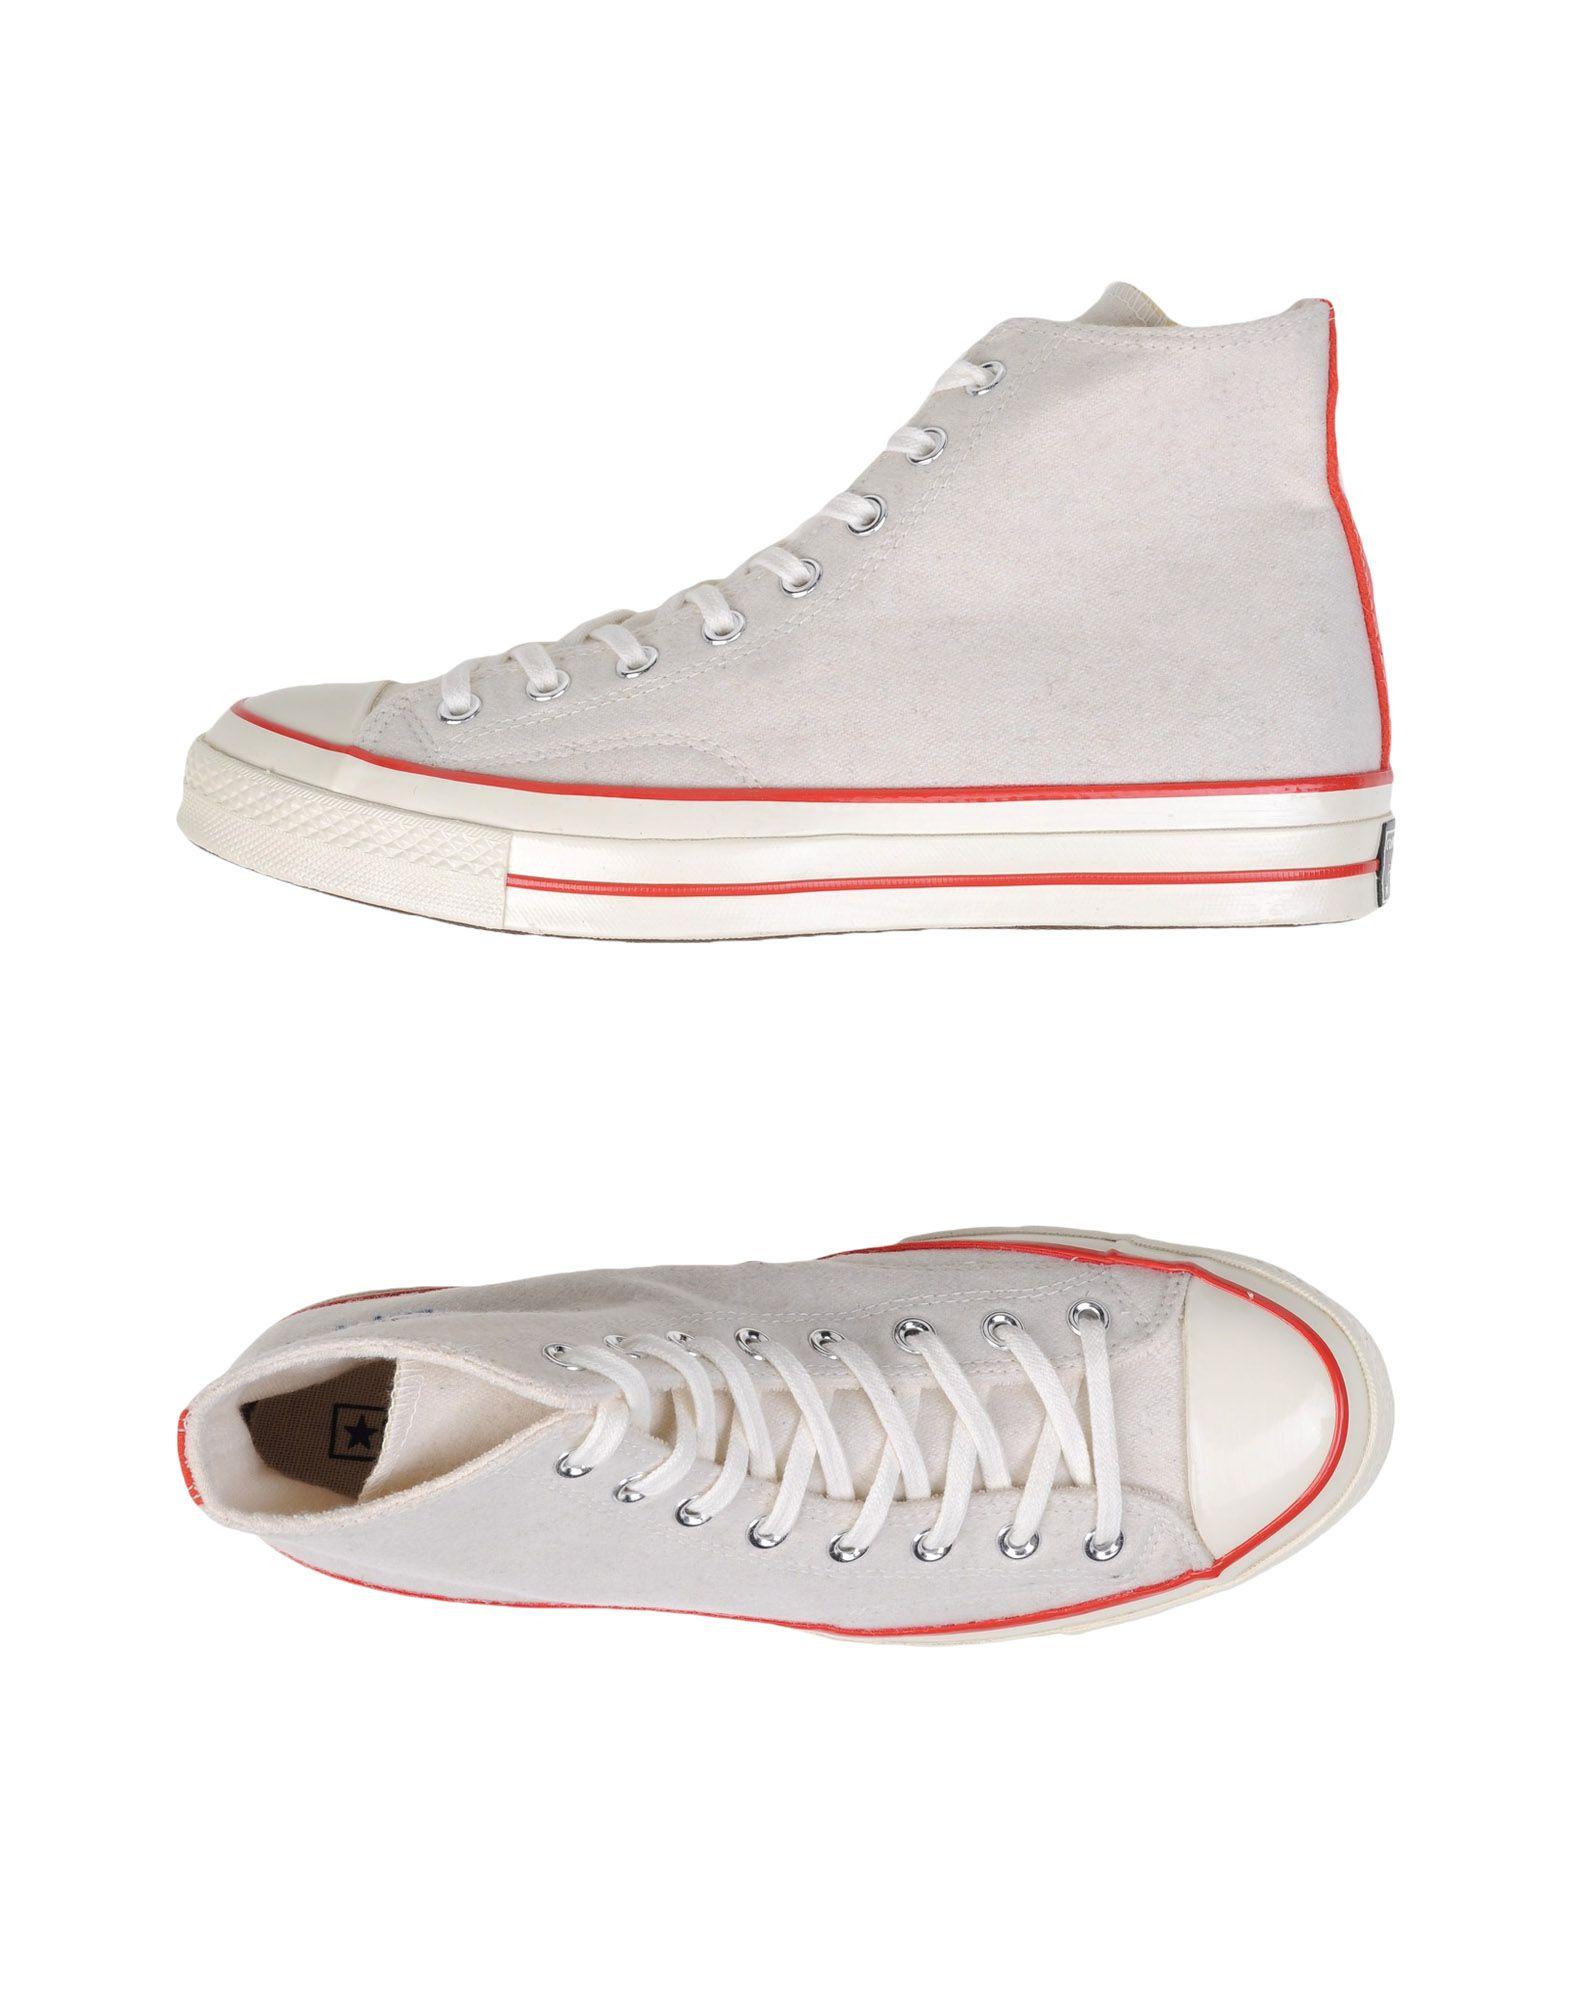 Rabatt echte Schuhe Converse Prem All Star All Star Prem Converse Hi 1970'S Wool  11114090VA 7adbf6